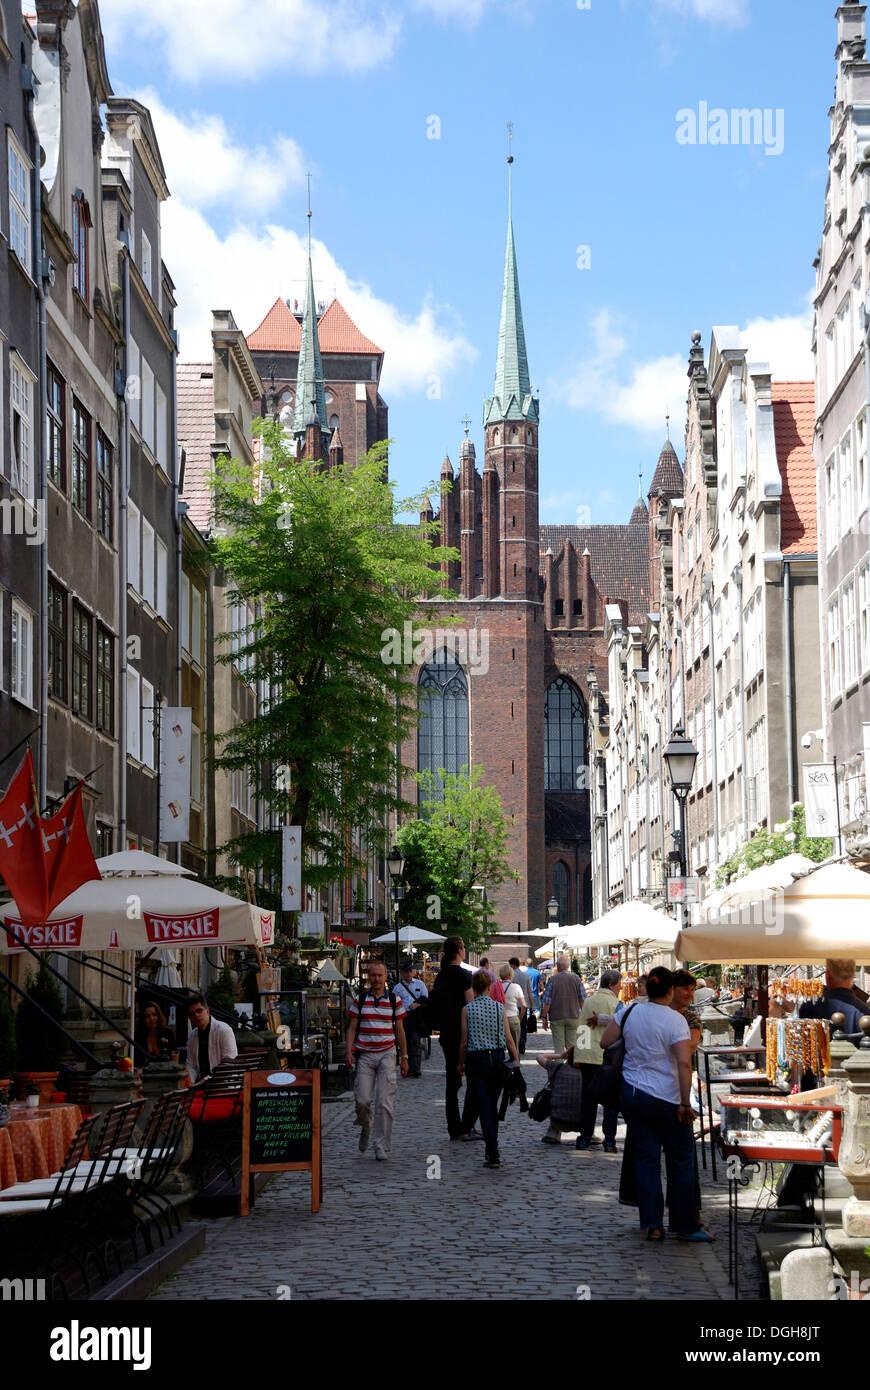 Mary's Street with views of the St. Mary's Church of Gdansk - Kosciol Mariacki. - Stock Image